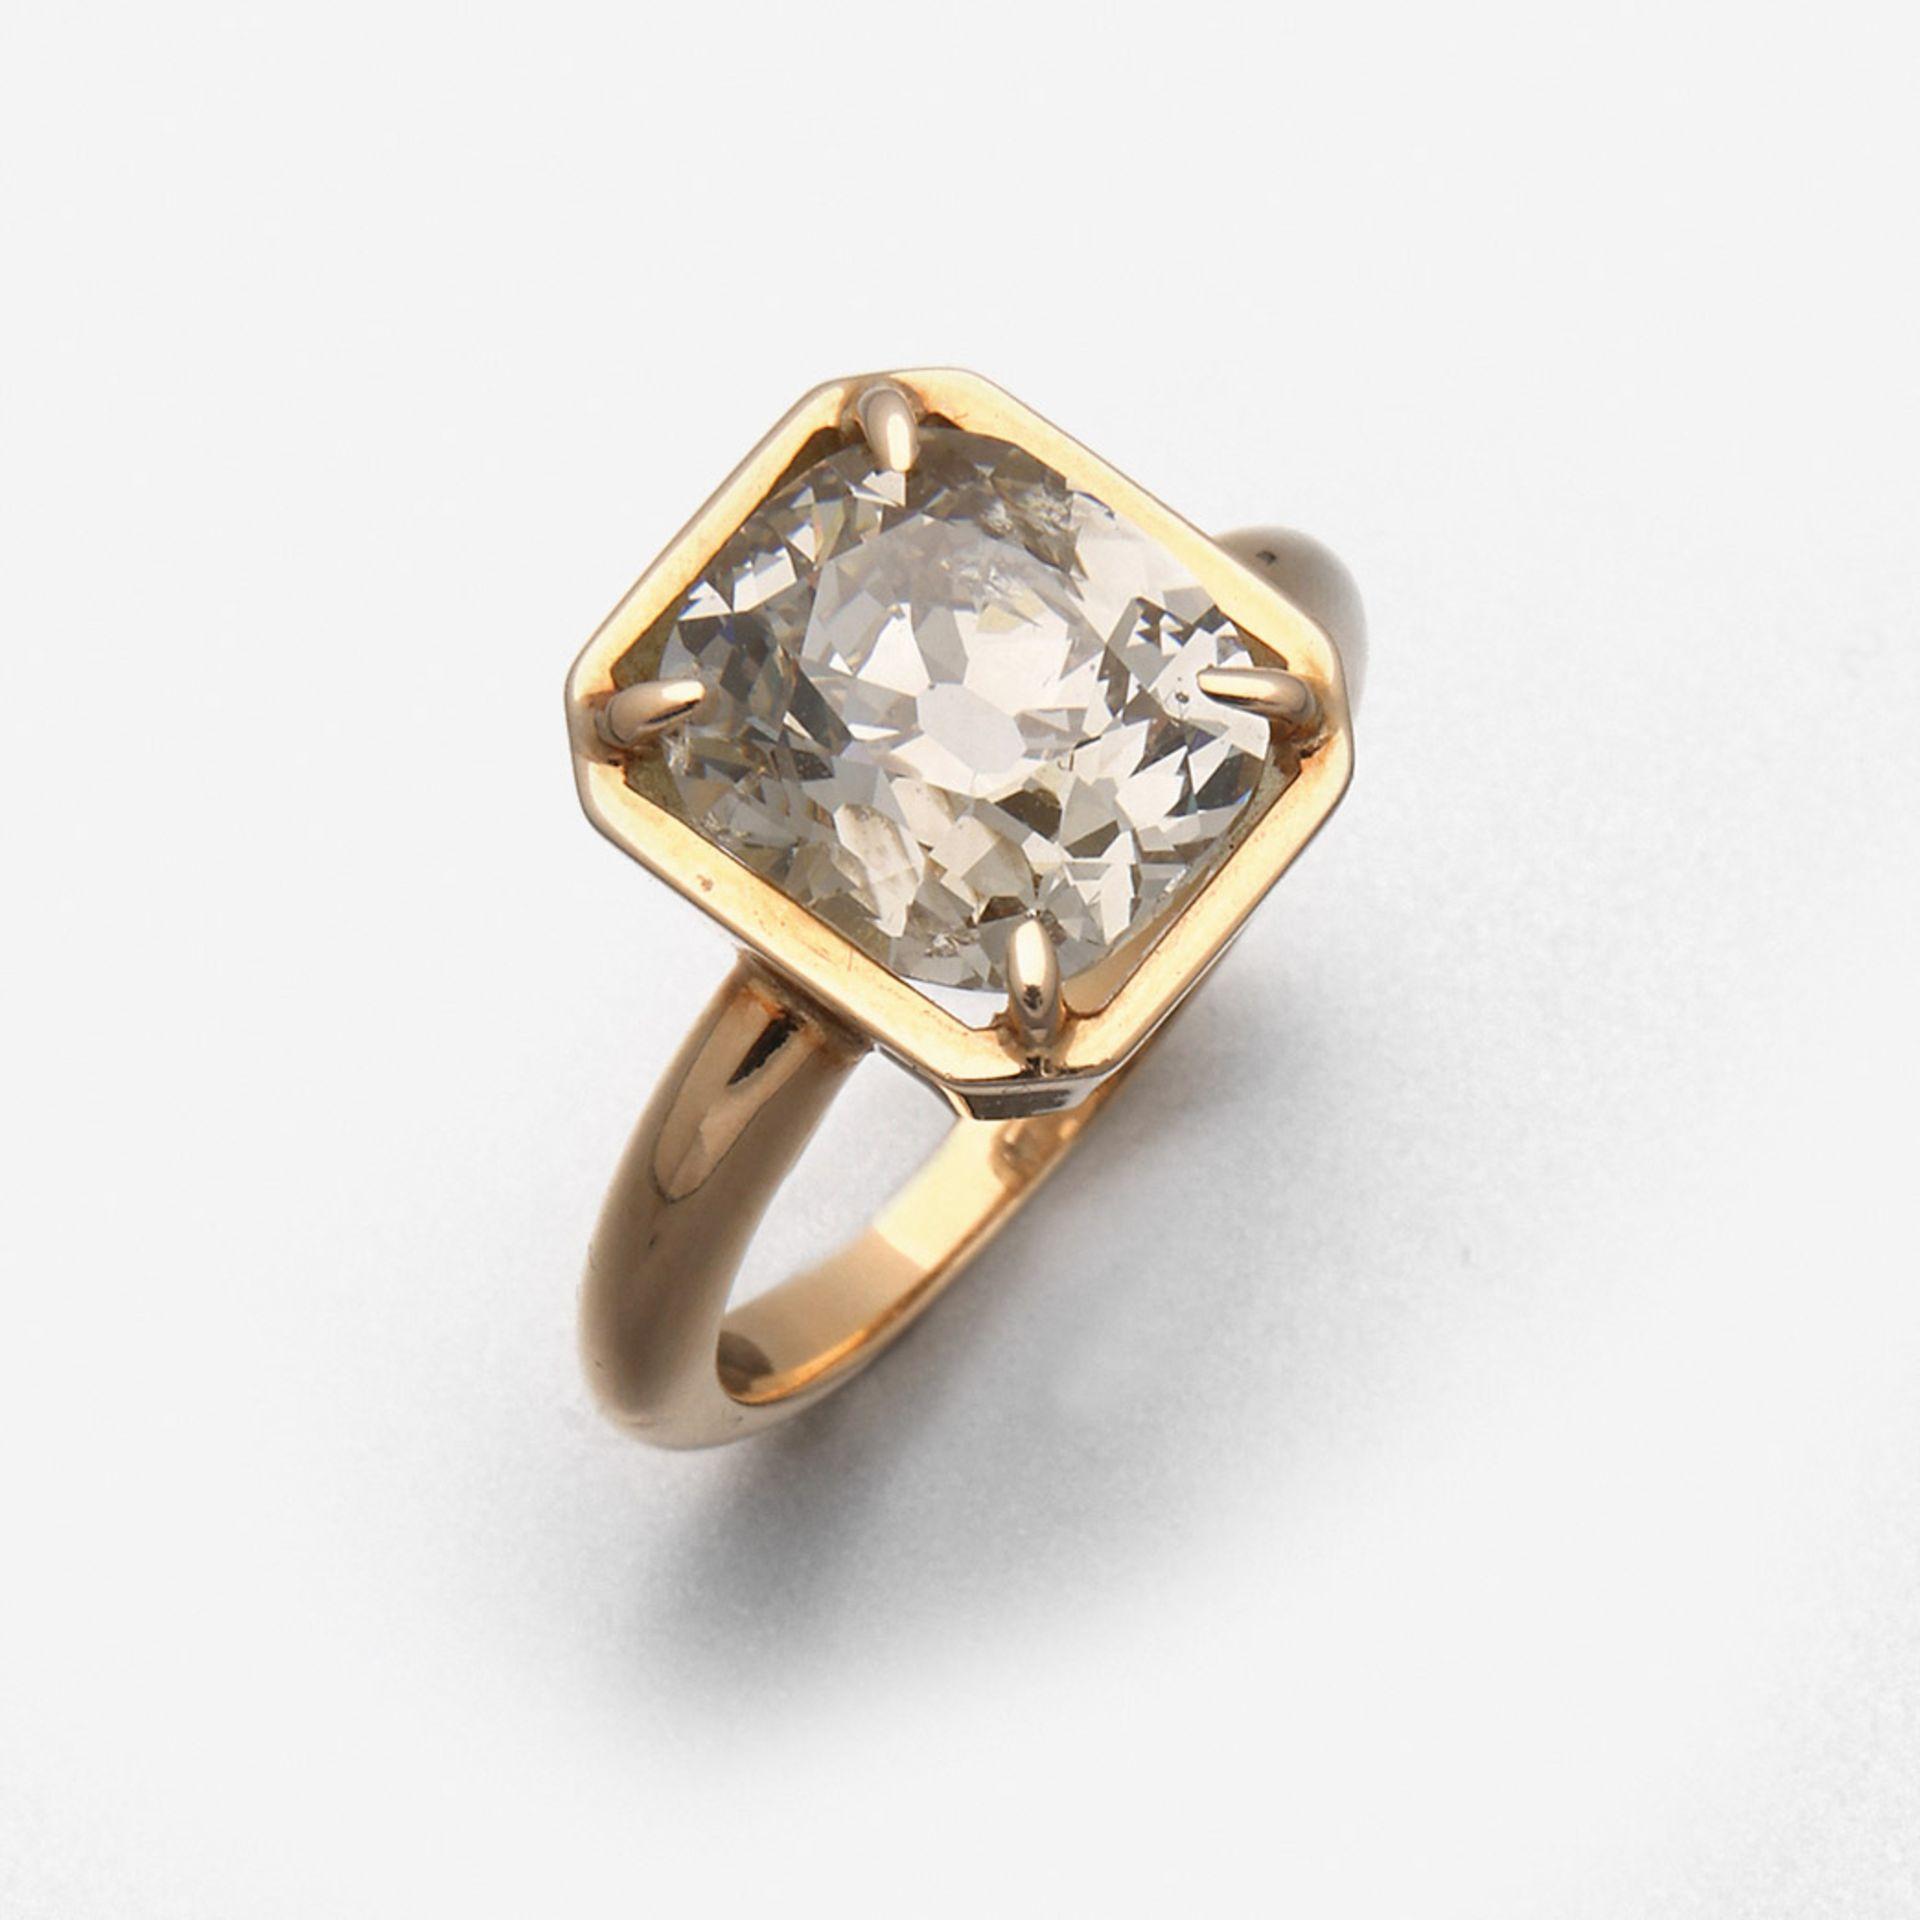 Großer Diamantsolitärring